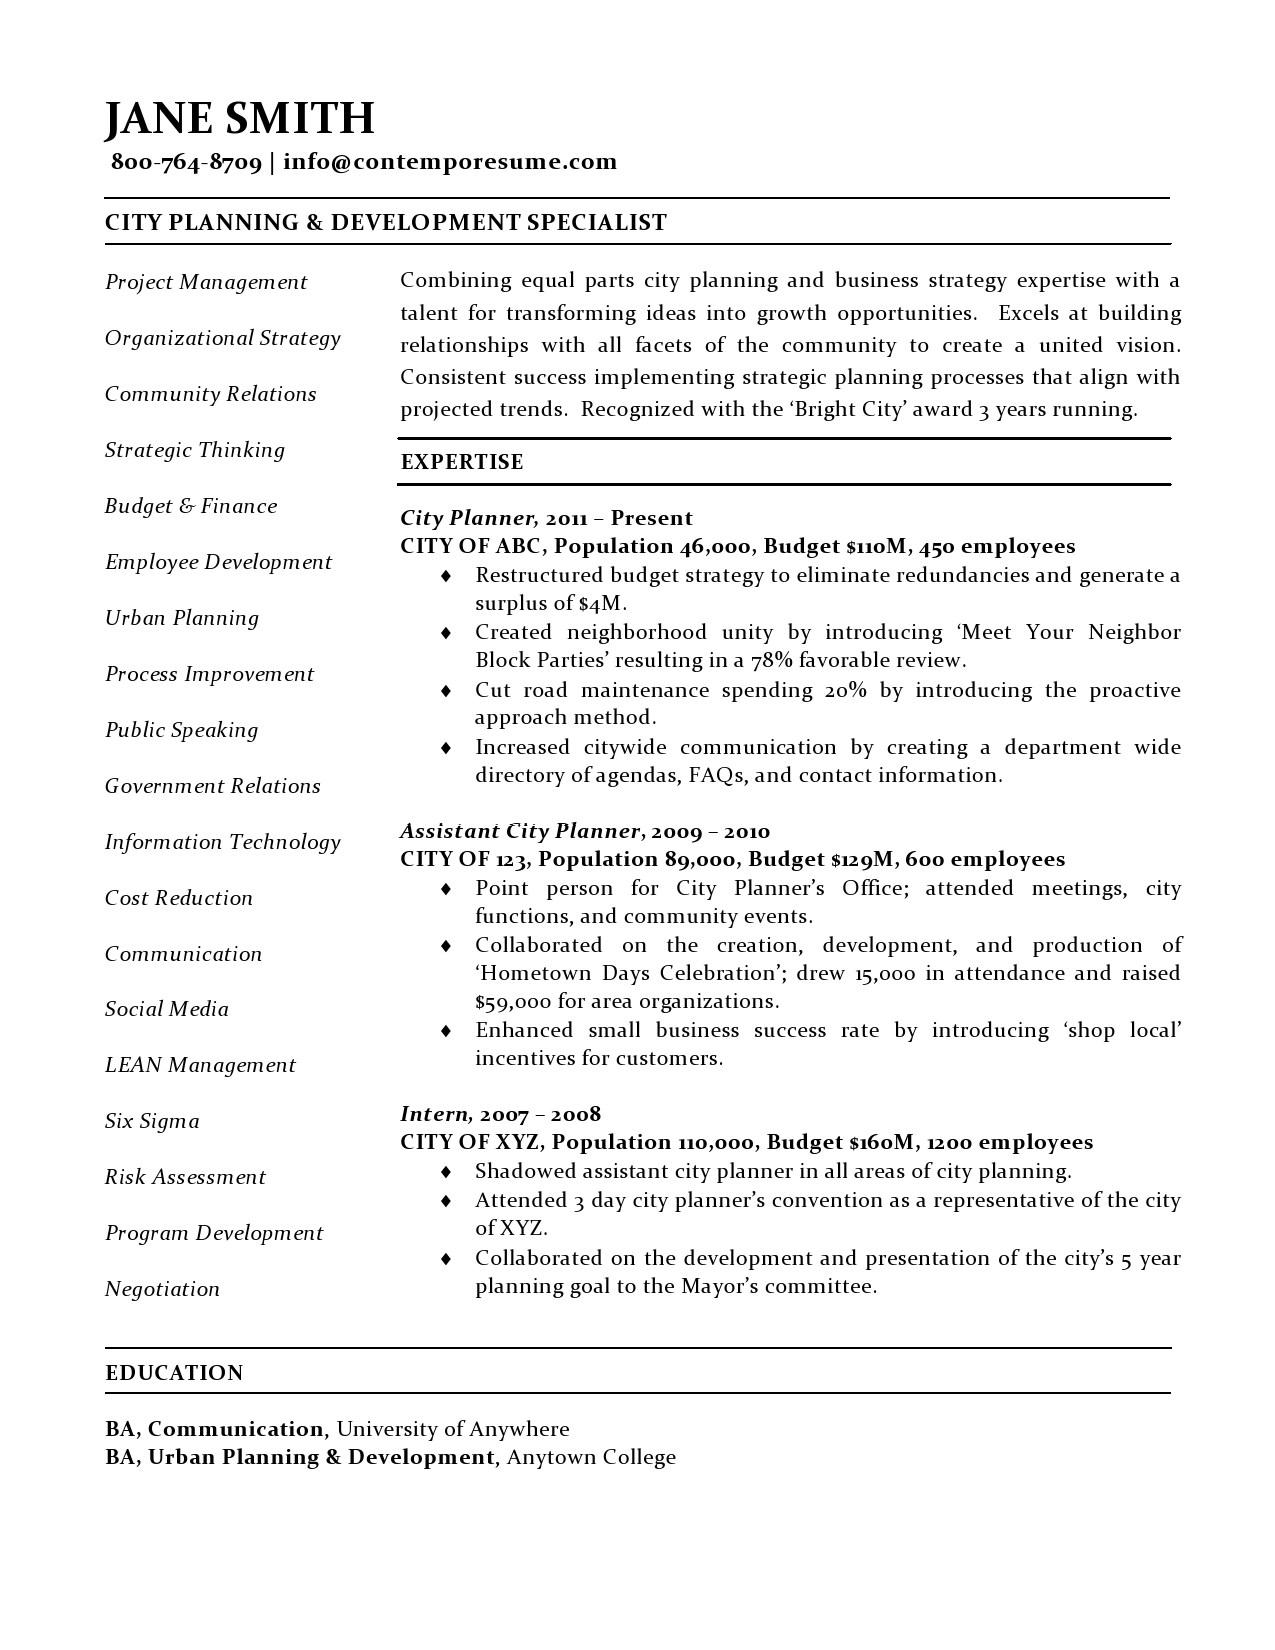 City Planner Resume